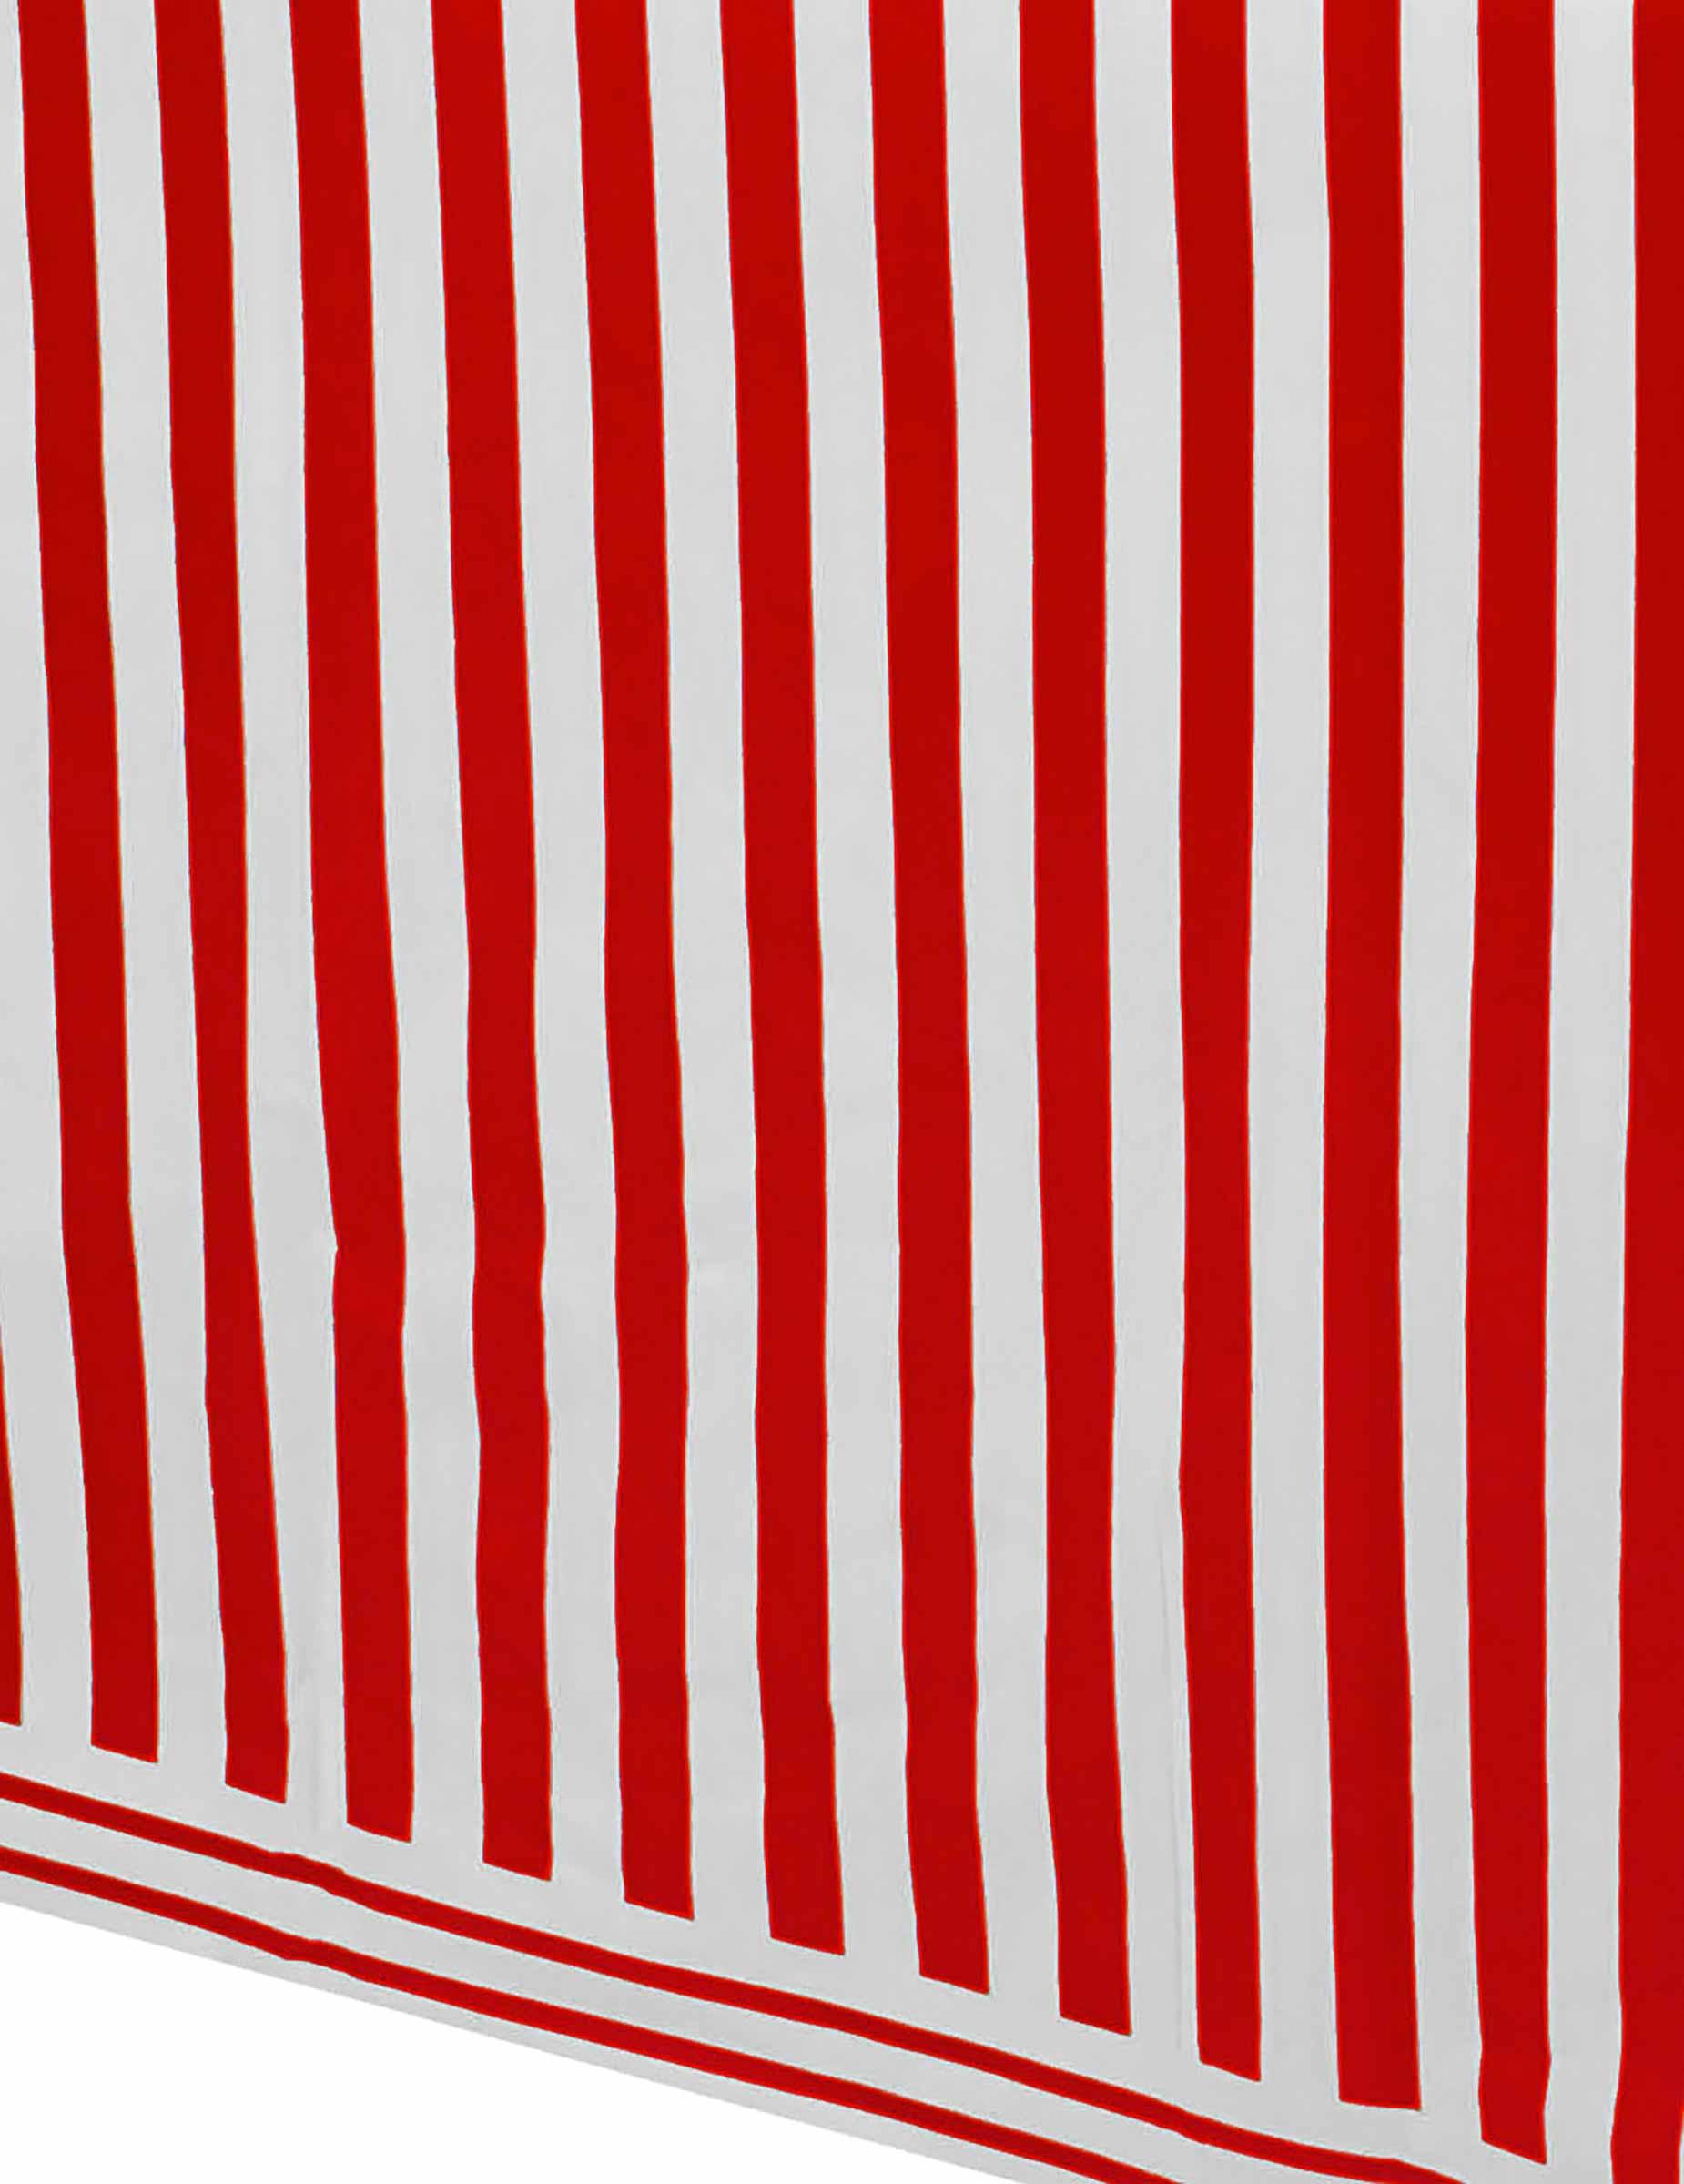 rot wei e gestreifte tischdecke aus plastik 137 x 274 cm. Black Bedroom Furniture Sets. Home Design Ideas